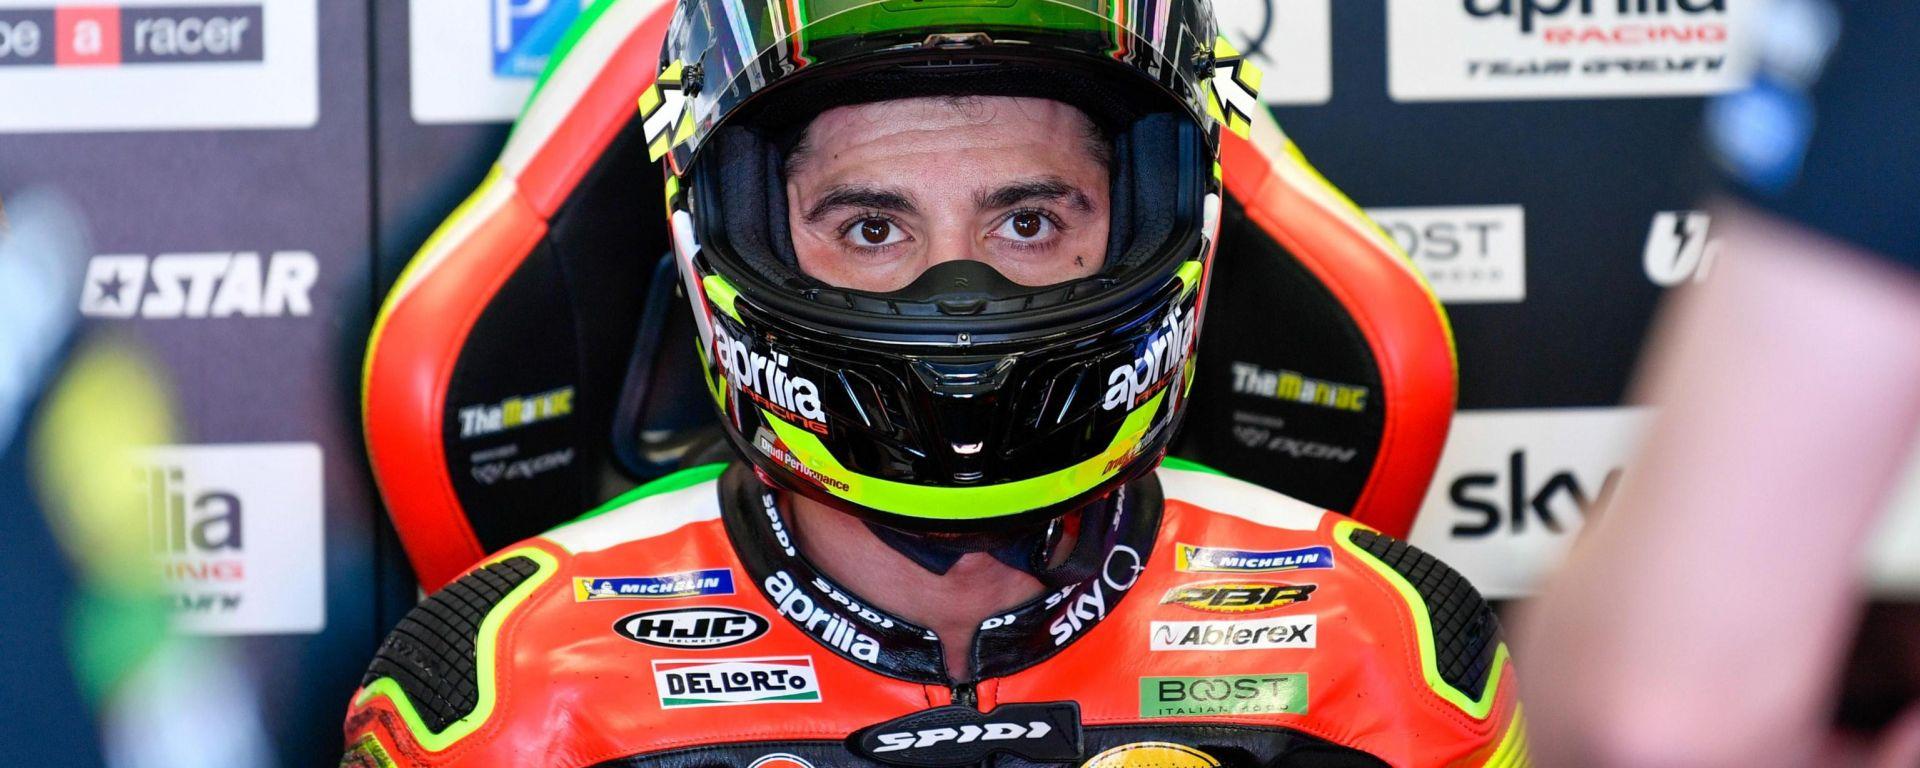 MotoGP, Andrea Iannone (Aprilia)